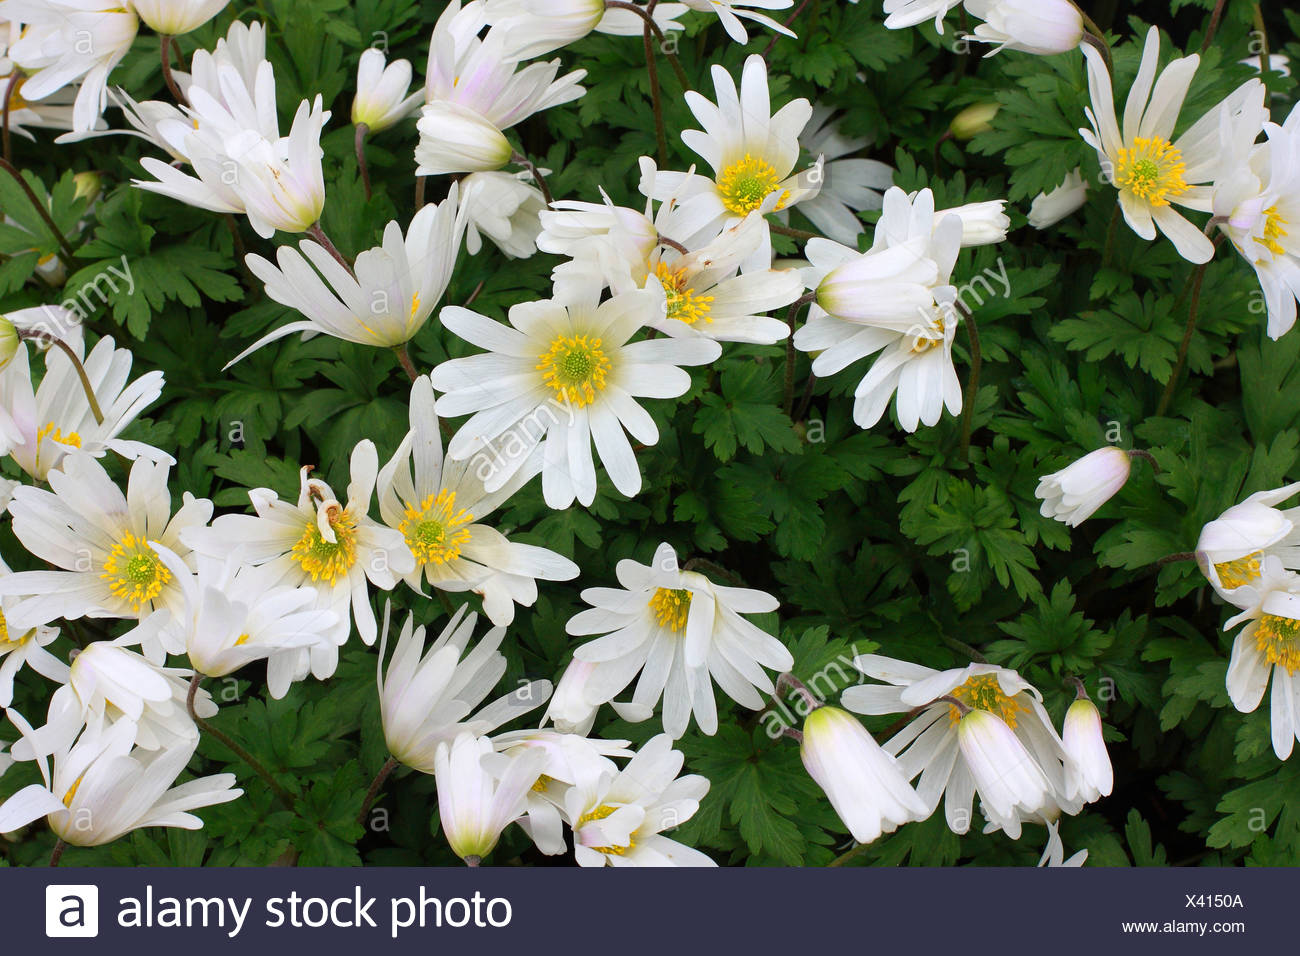 Small white flowers growing on a small shrub stock photo 277850394 small white flowers growing on a small shrub mightylinksfo